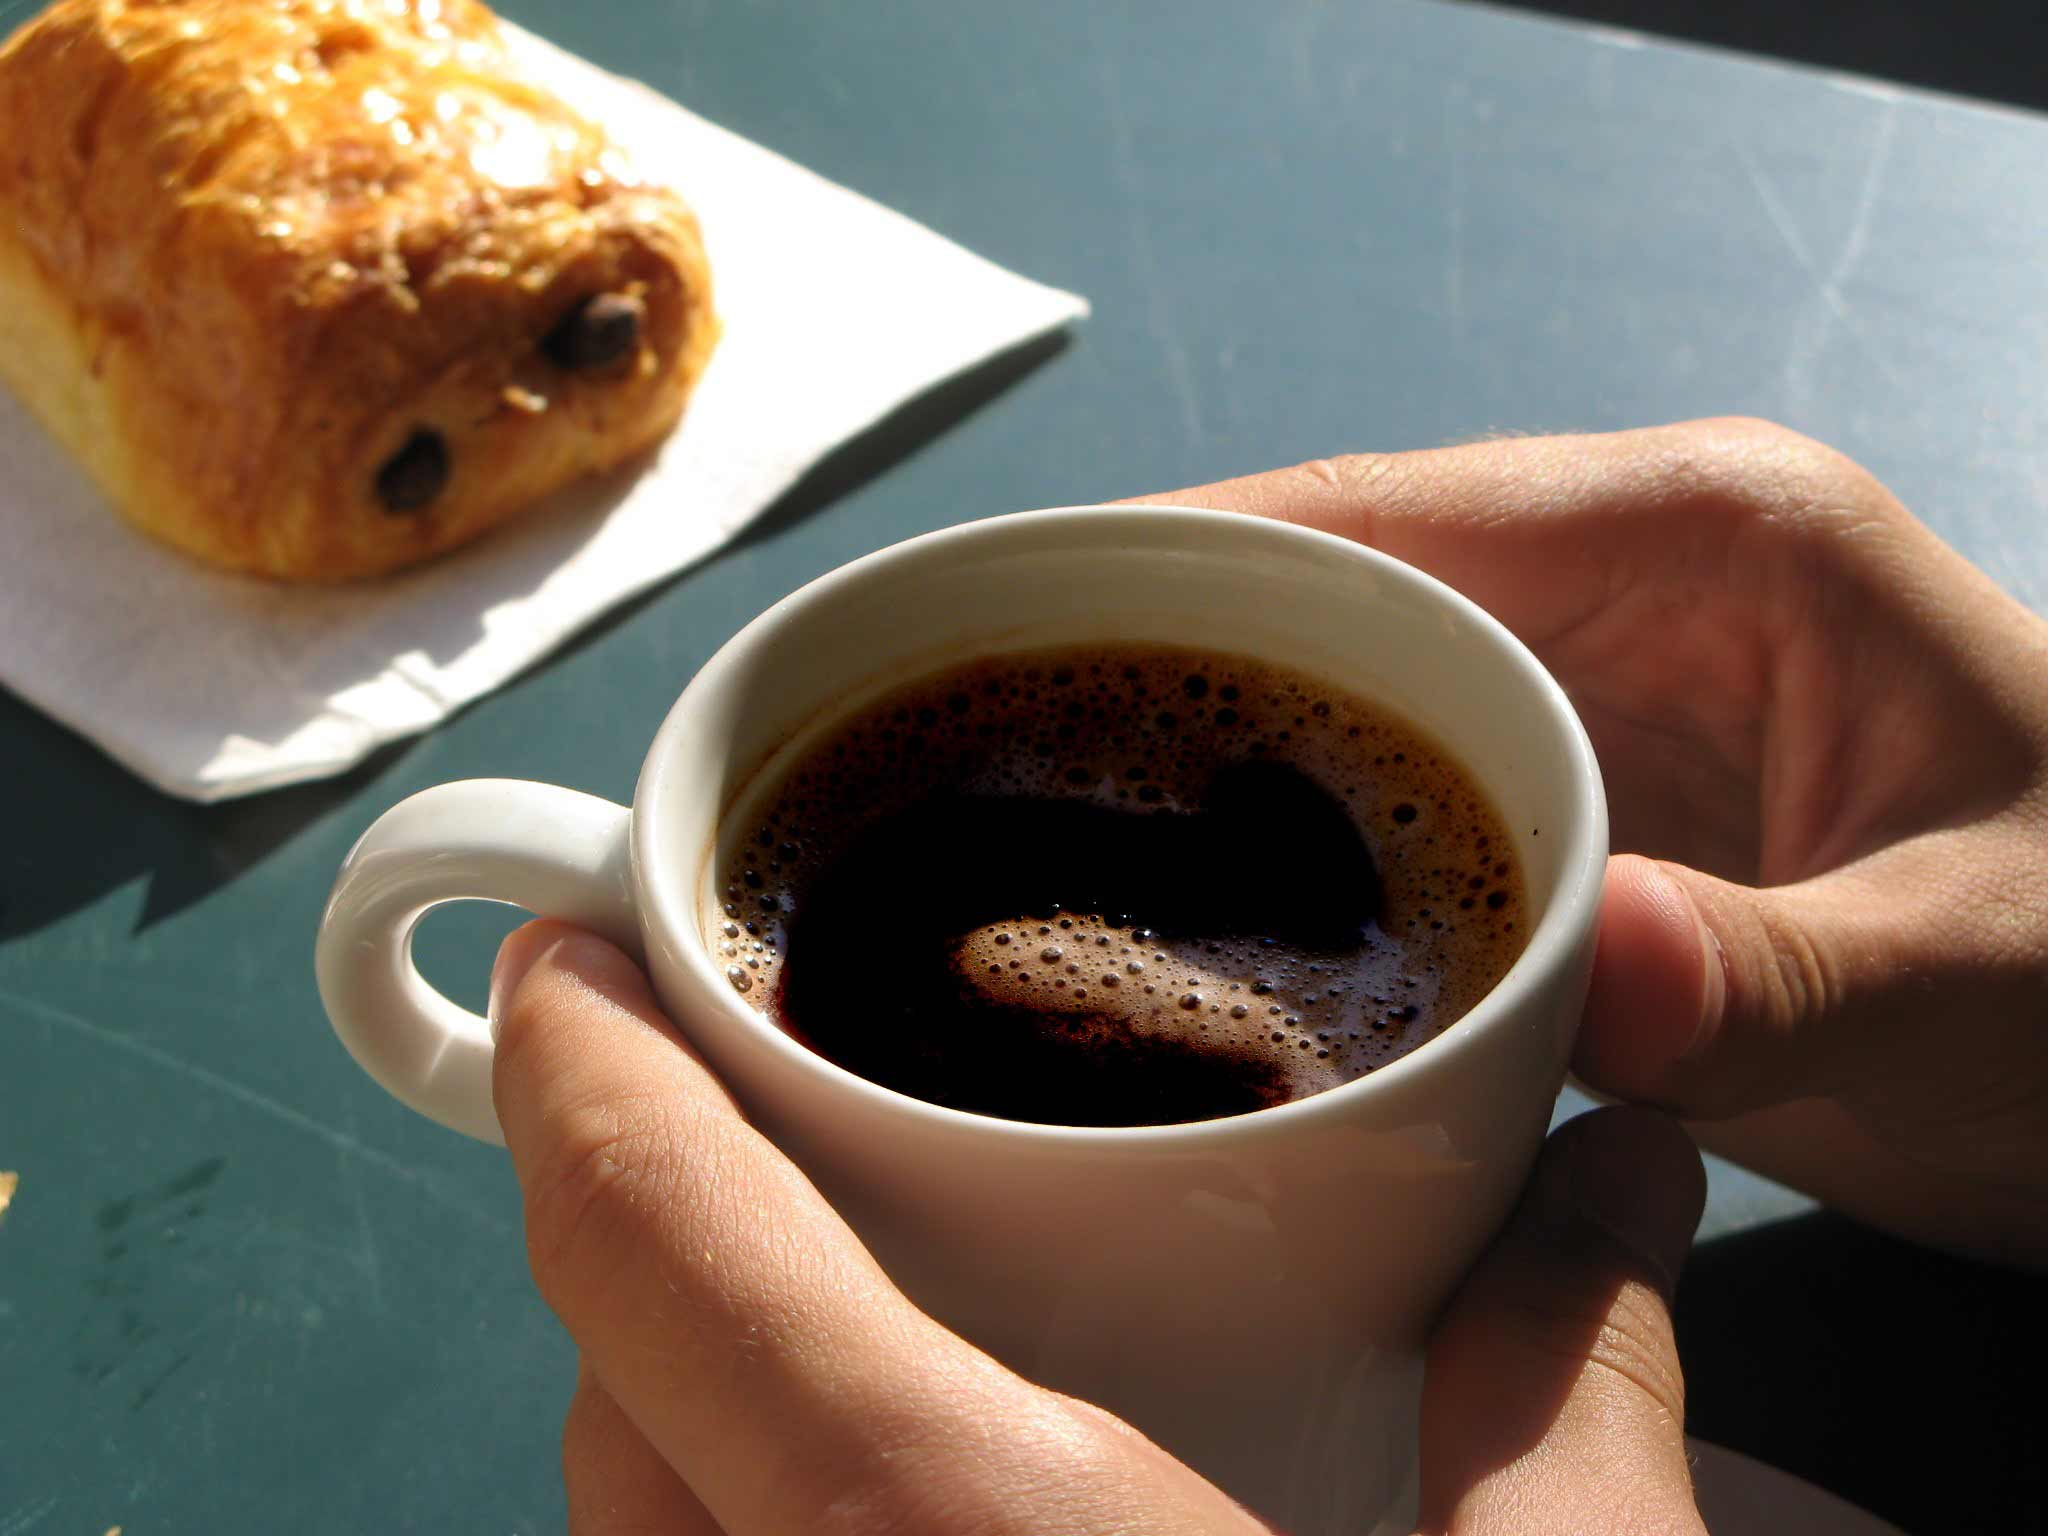 cafeaua cauzeaza acnee